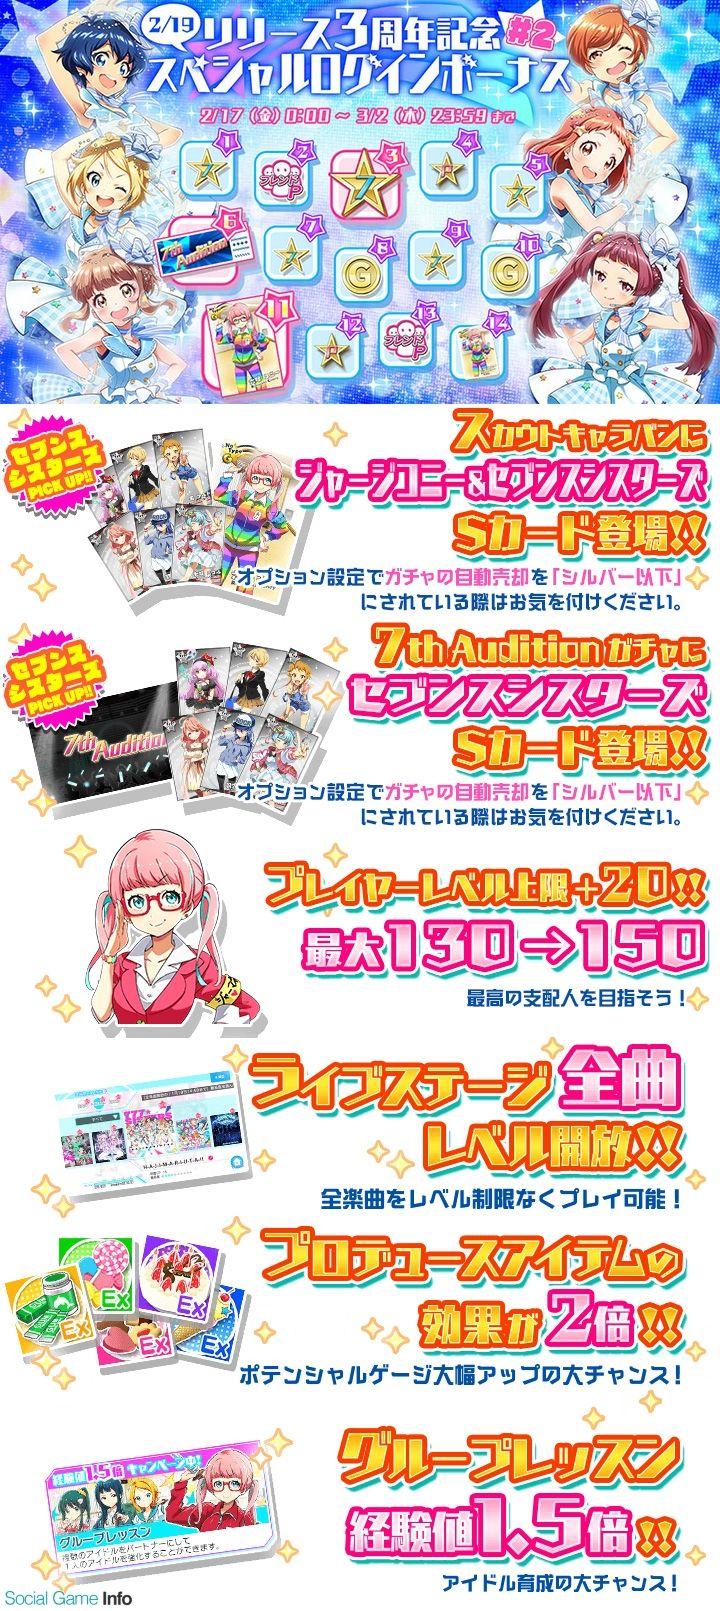 Donuts、『Tokyo 7th シスターズ』リリース3周年記念の大型アップデートを実施! 豪華賞品がもらえる事前登録キャンペーンも開催中‼︎   Social Game Info